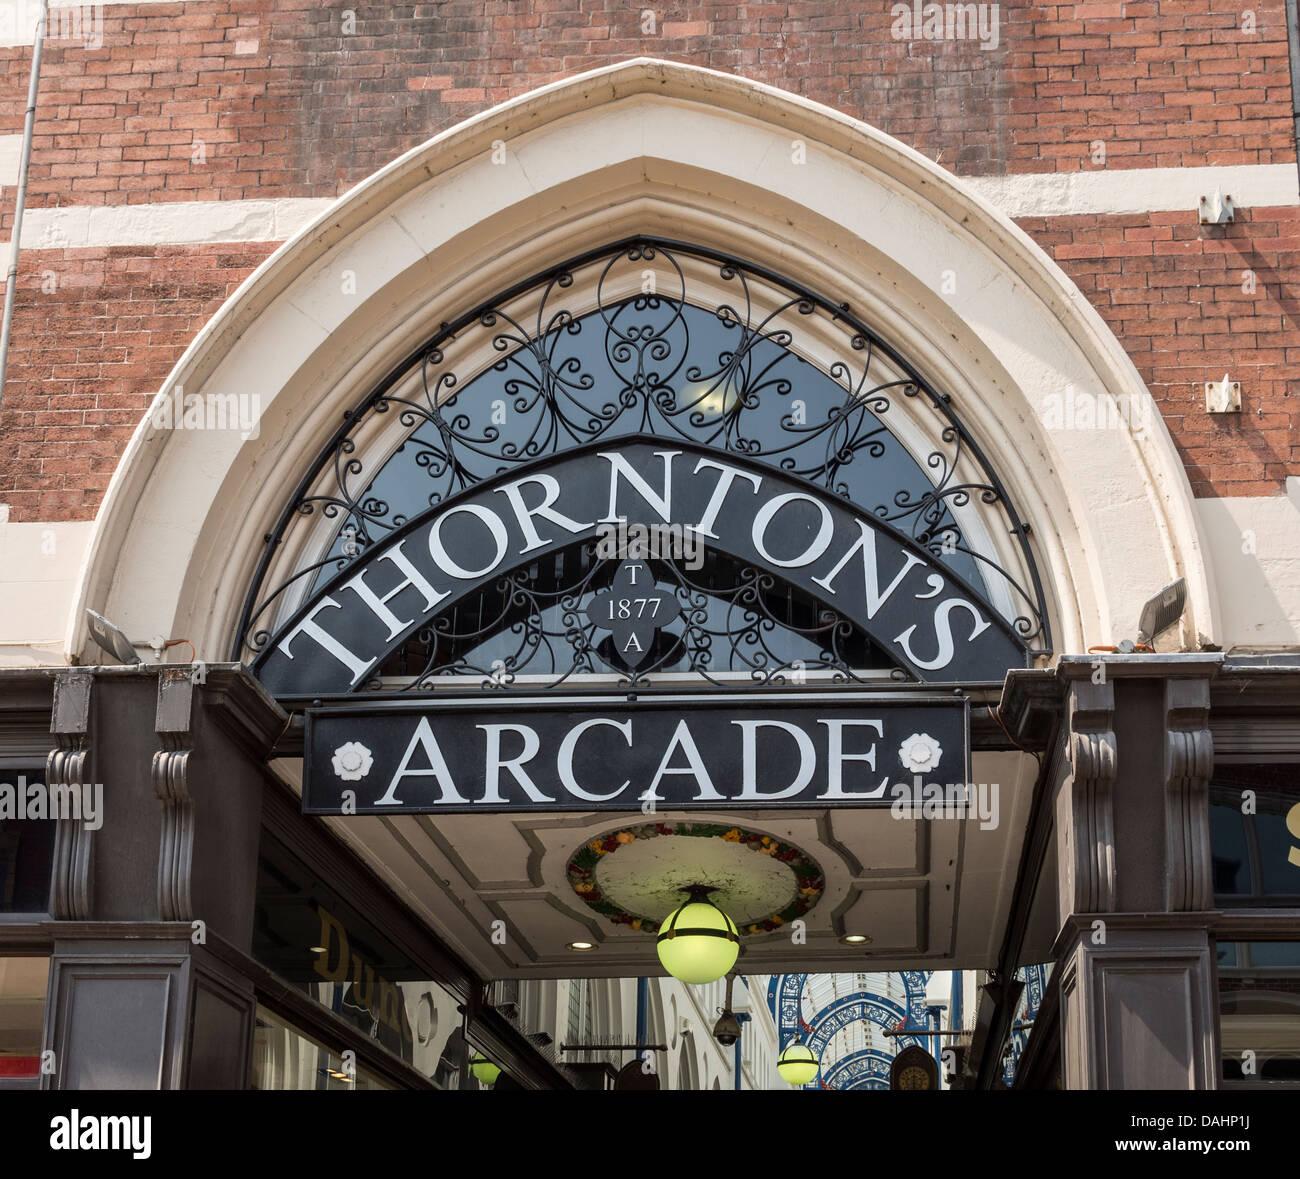 Entrance sign to Thorntons Arcade 1887 Leeds UK - Stock Image